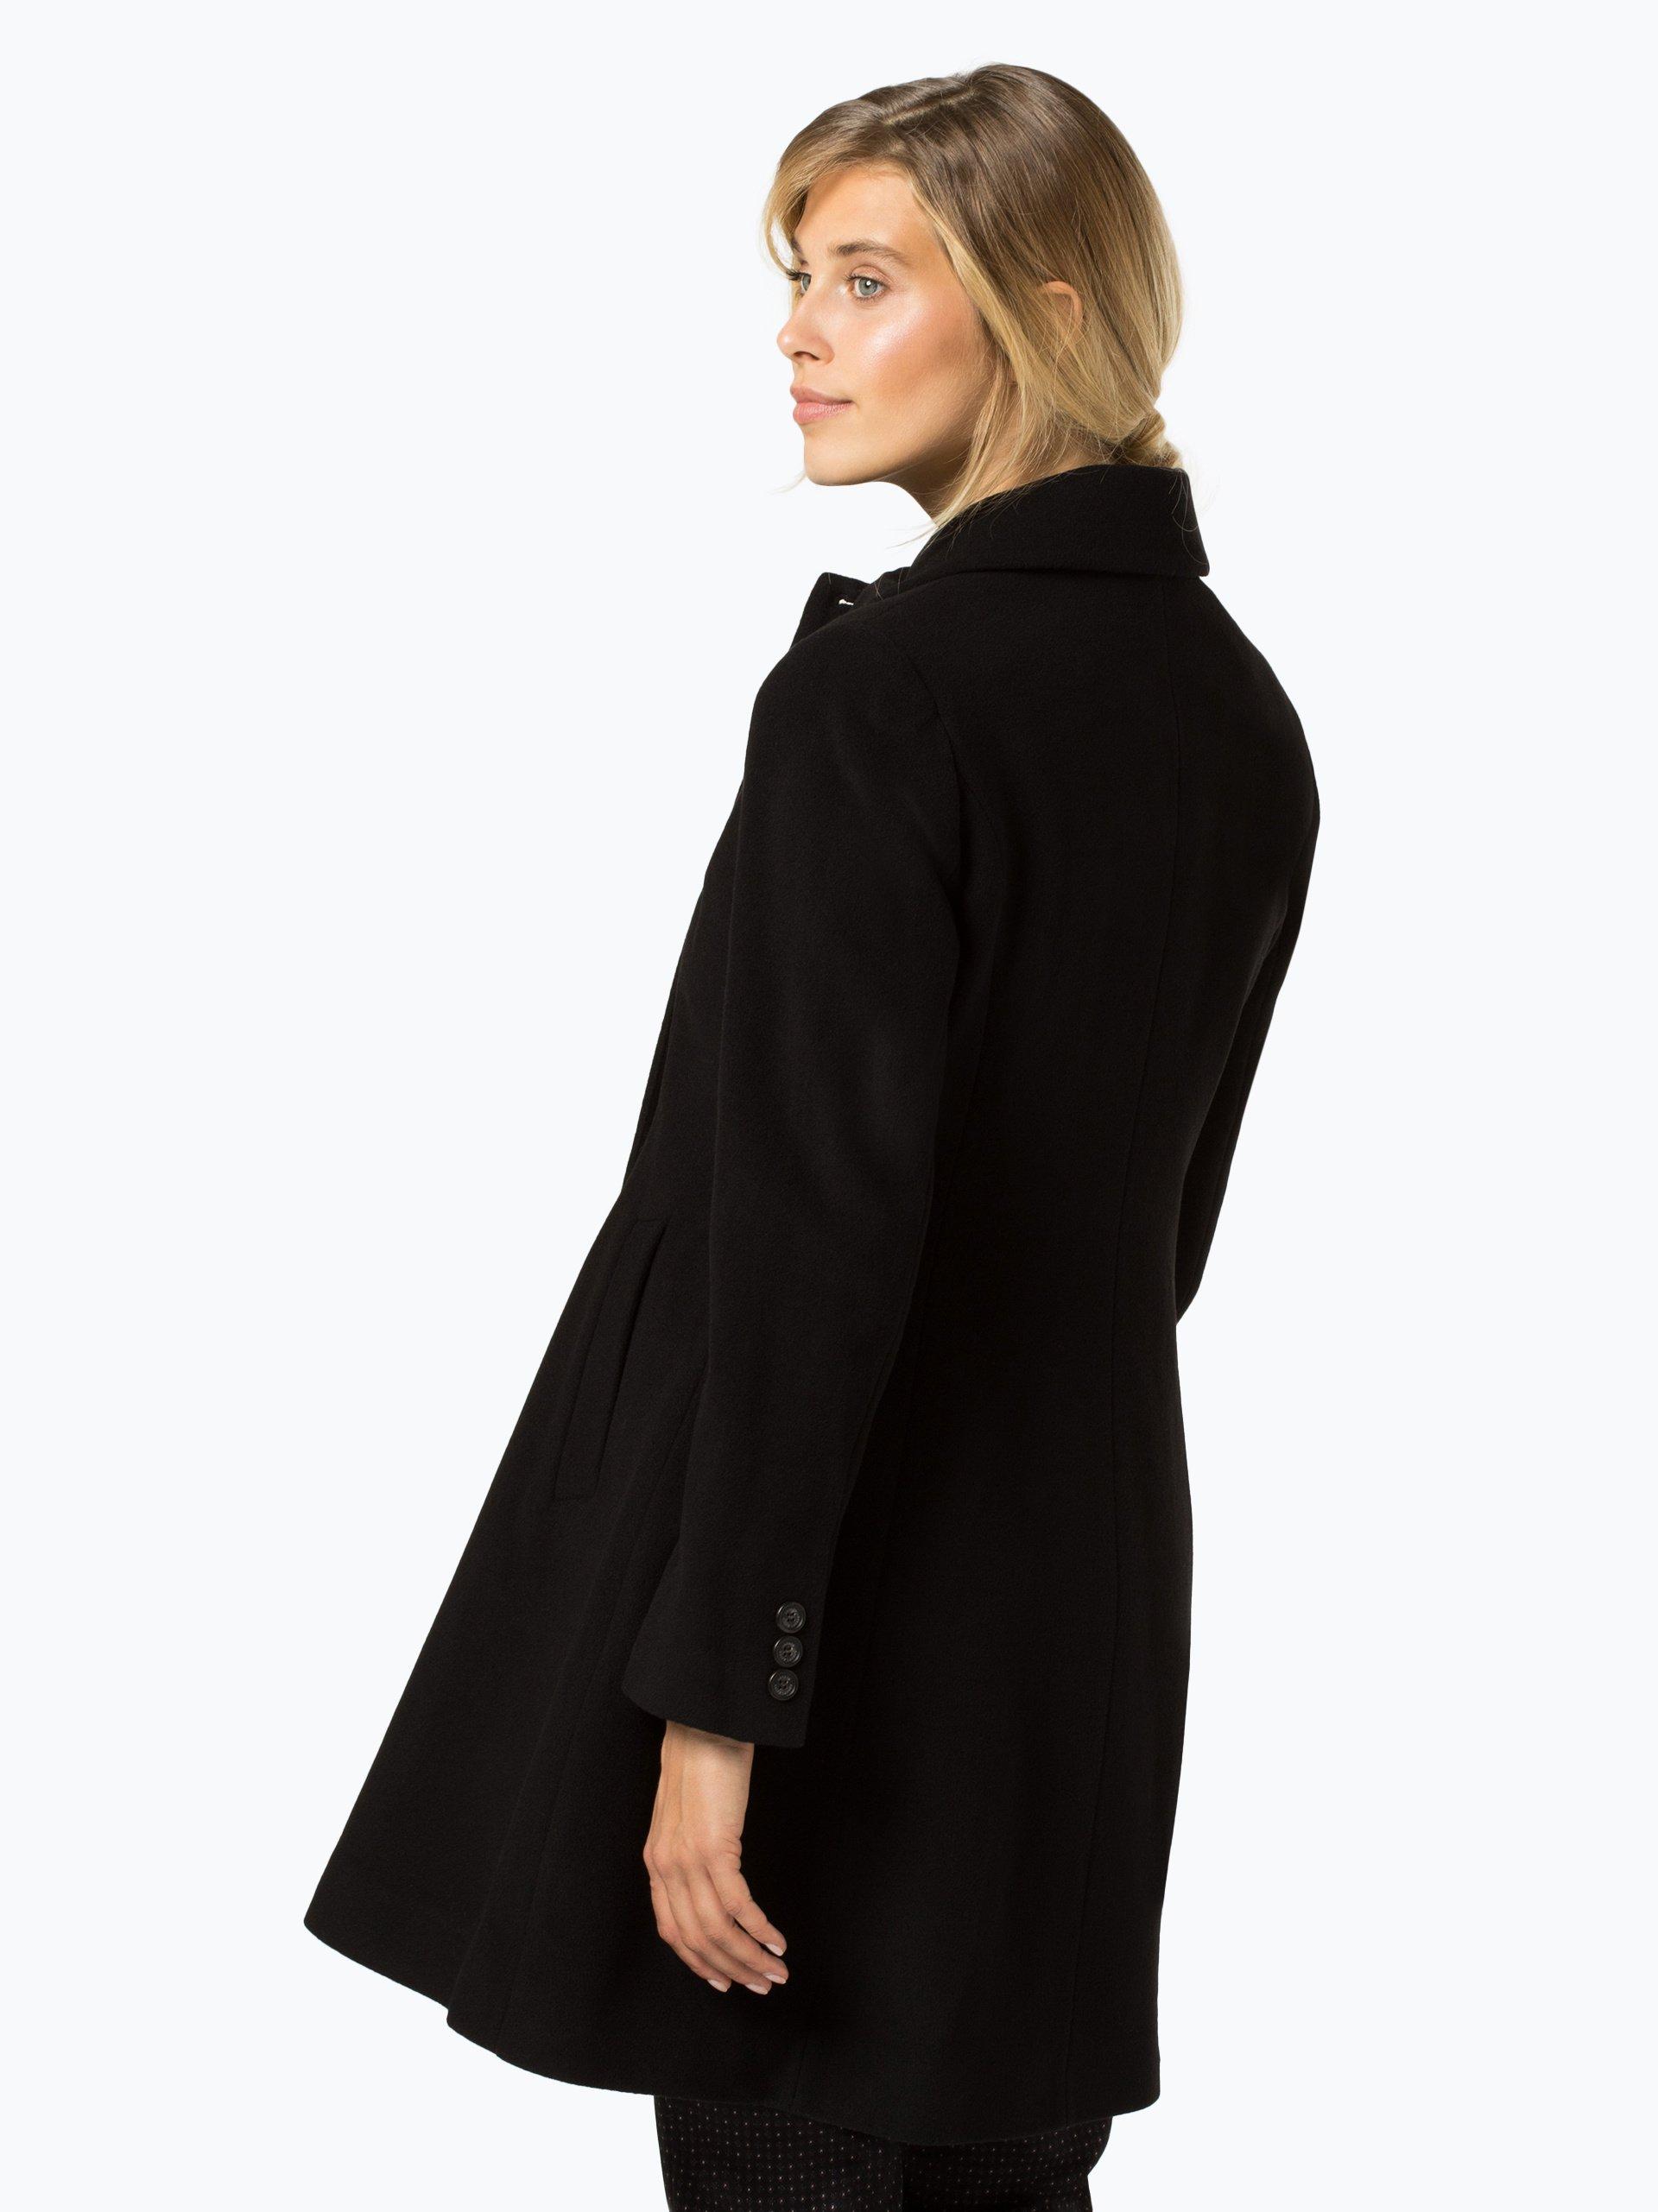 lauren ralph lauren damen mantel mit cashmere anteil. Black Bedroom Furniture Sets. Home Design Ideas